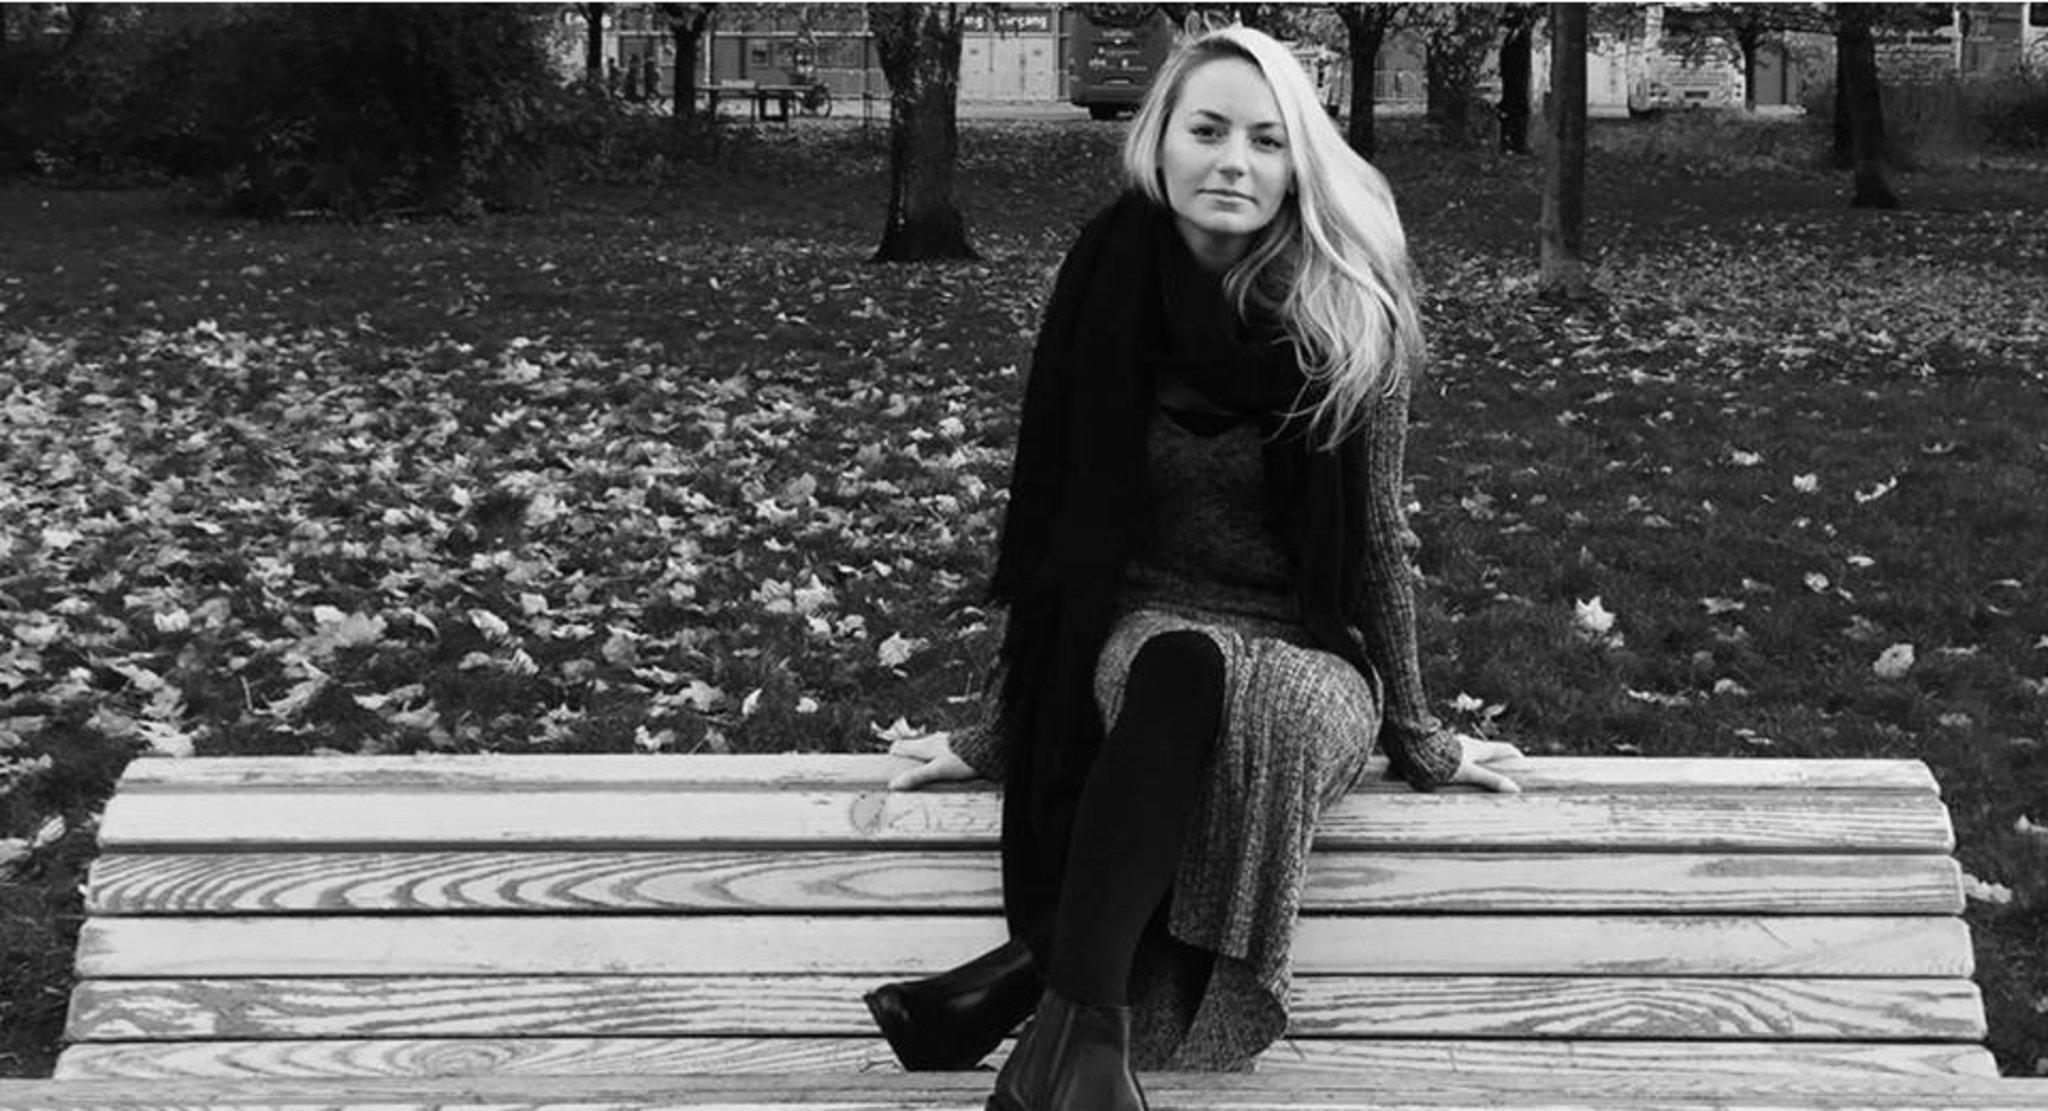 Festnahme in Spanien: Melanie Rehberger (†30): Zielfahnder